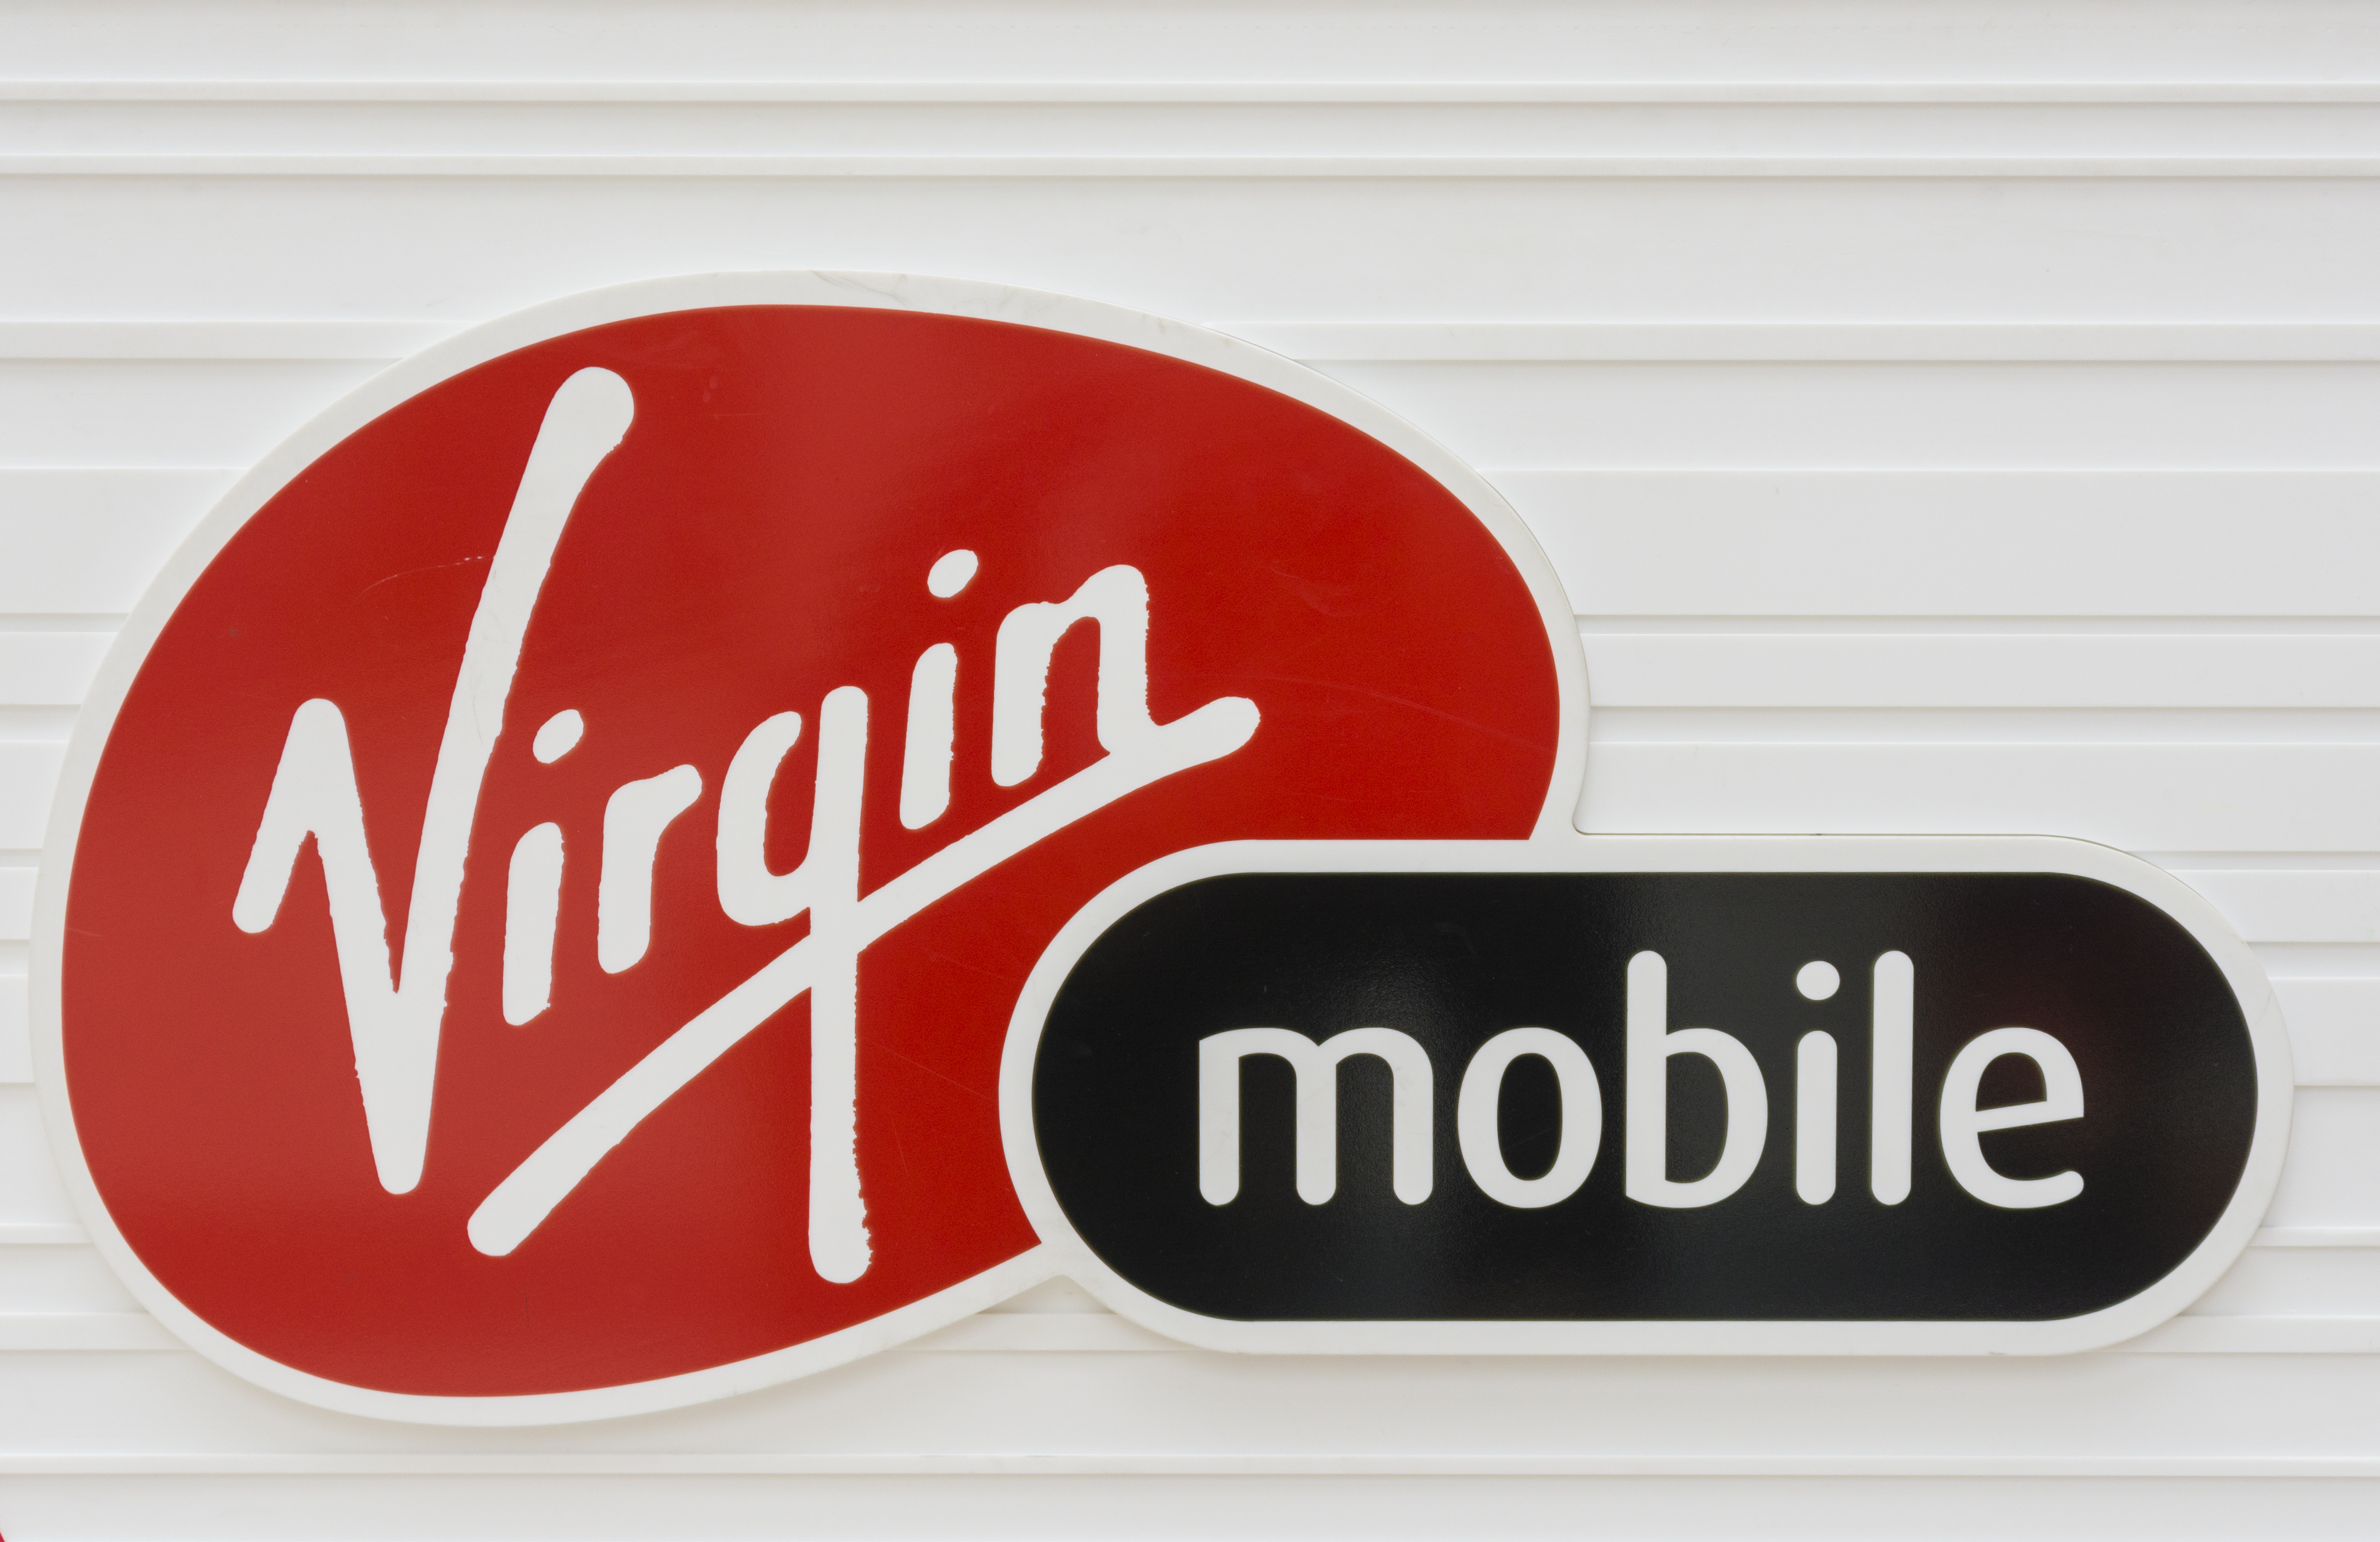 Logo of the brand Virgin Mobile. Virgin Mobile is a wireless...